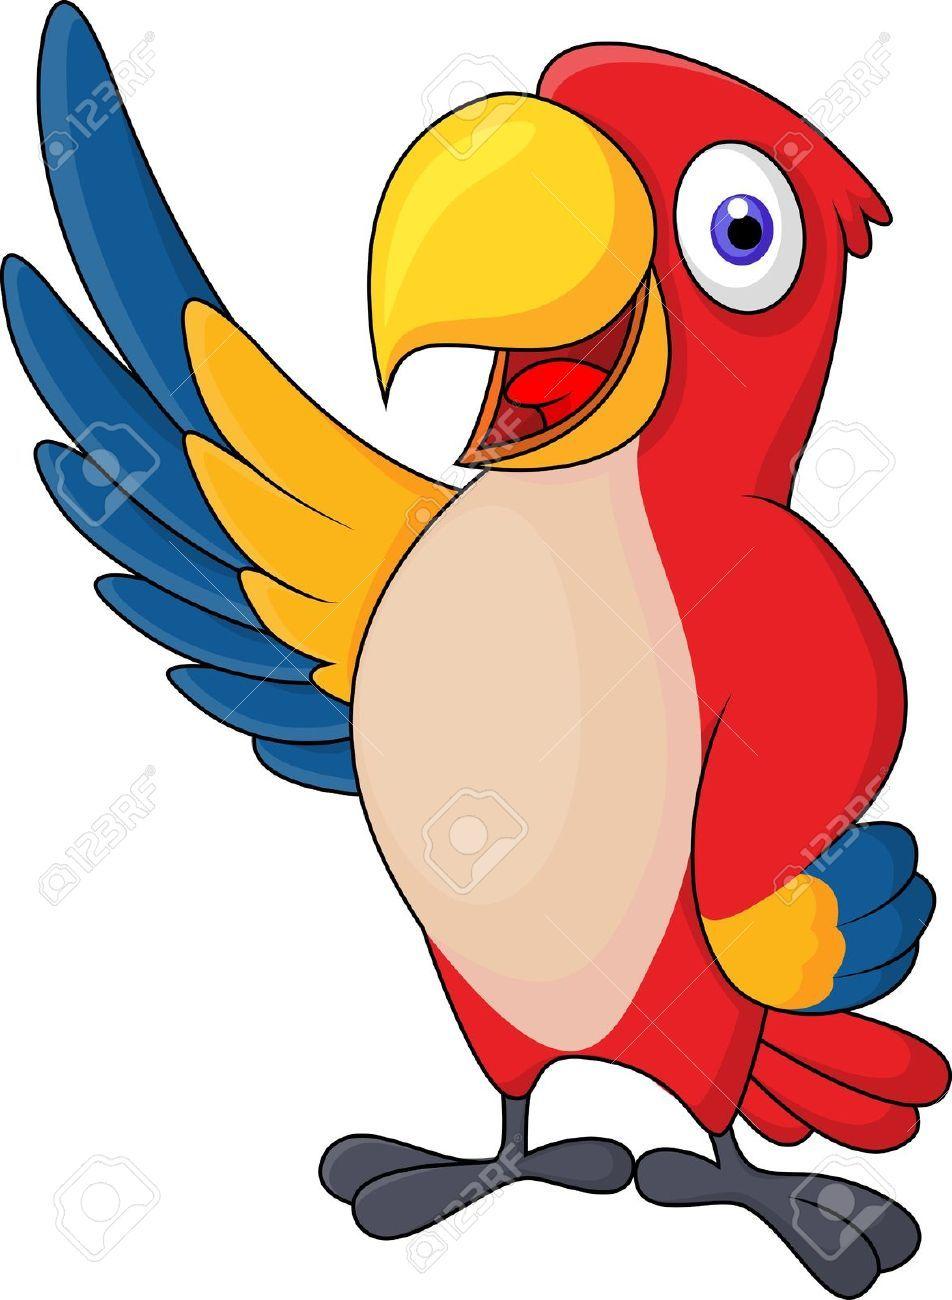 Cartoon Parrot Google Search Con Imagenes Animales Para Imprimir